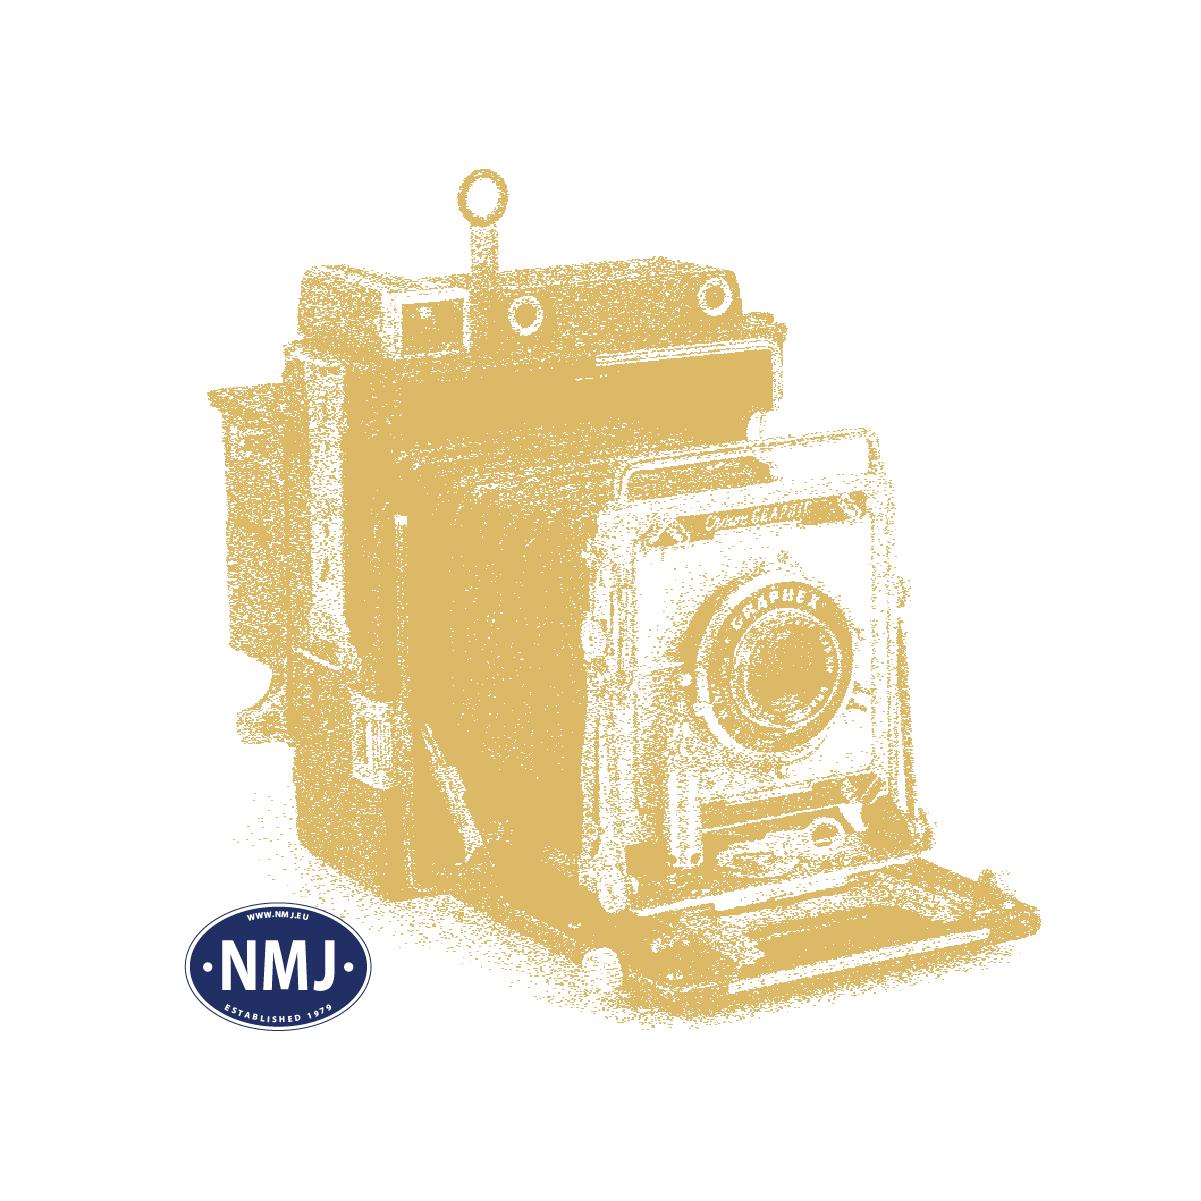 NMJT87.401AC - NMJ Topline NSB El11b.2146, Nydesign, AC Digital